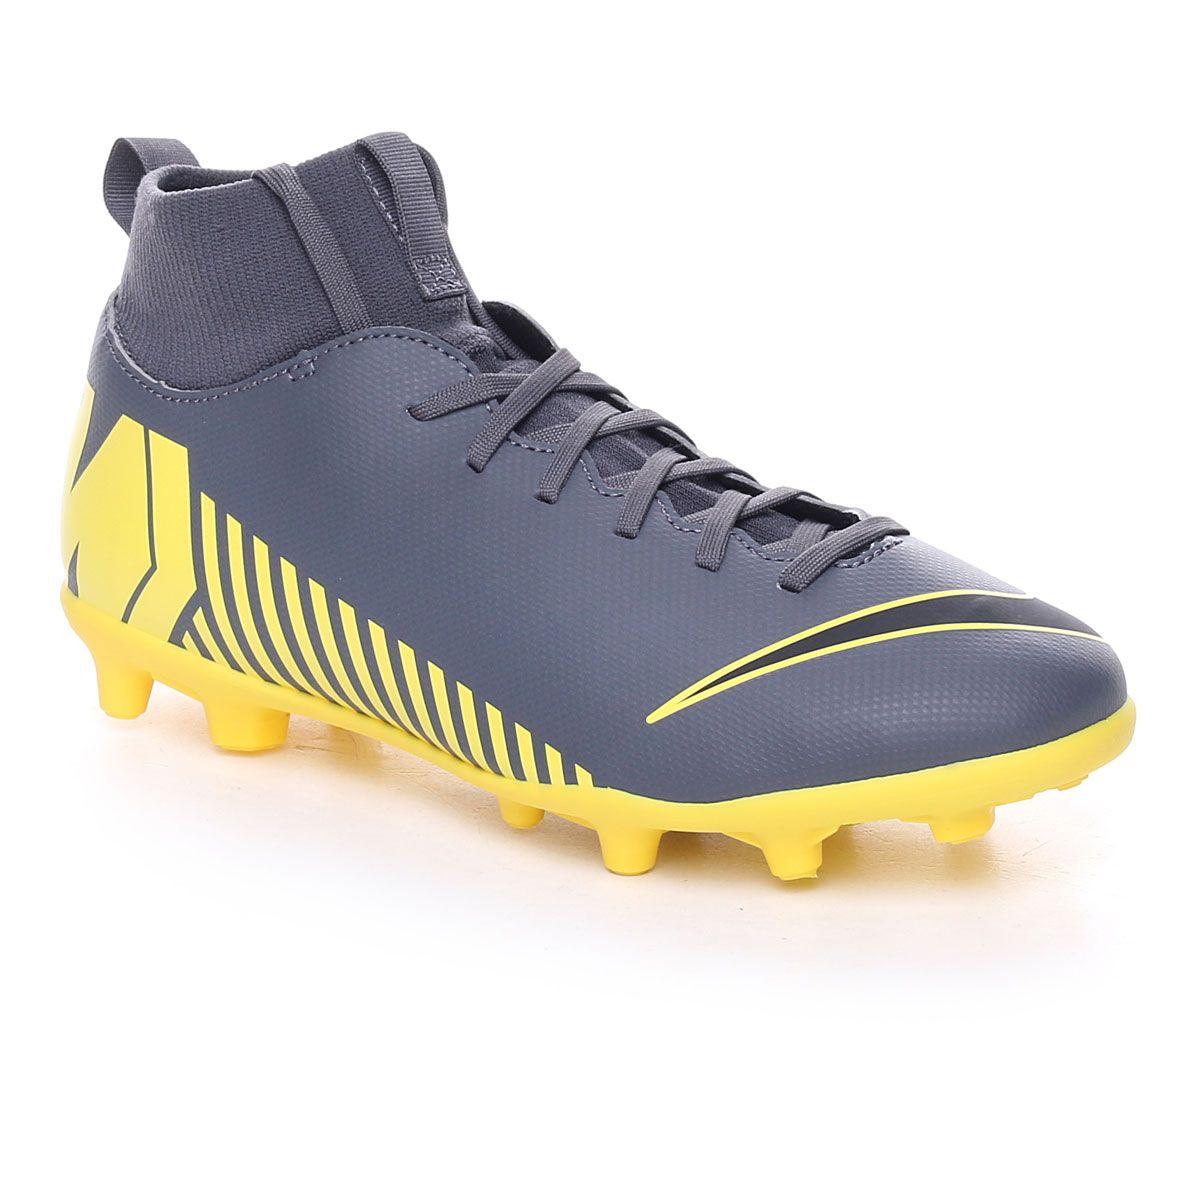 Nike Superfly 6 Club Mg Jr Grey Yellow